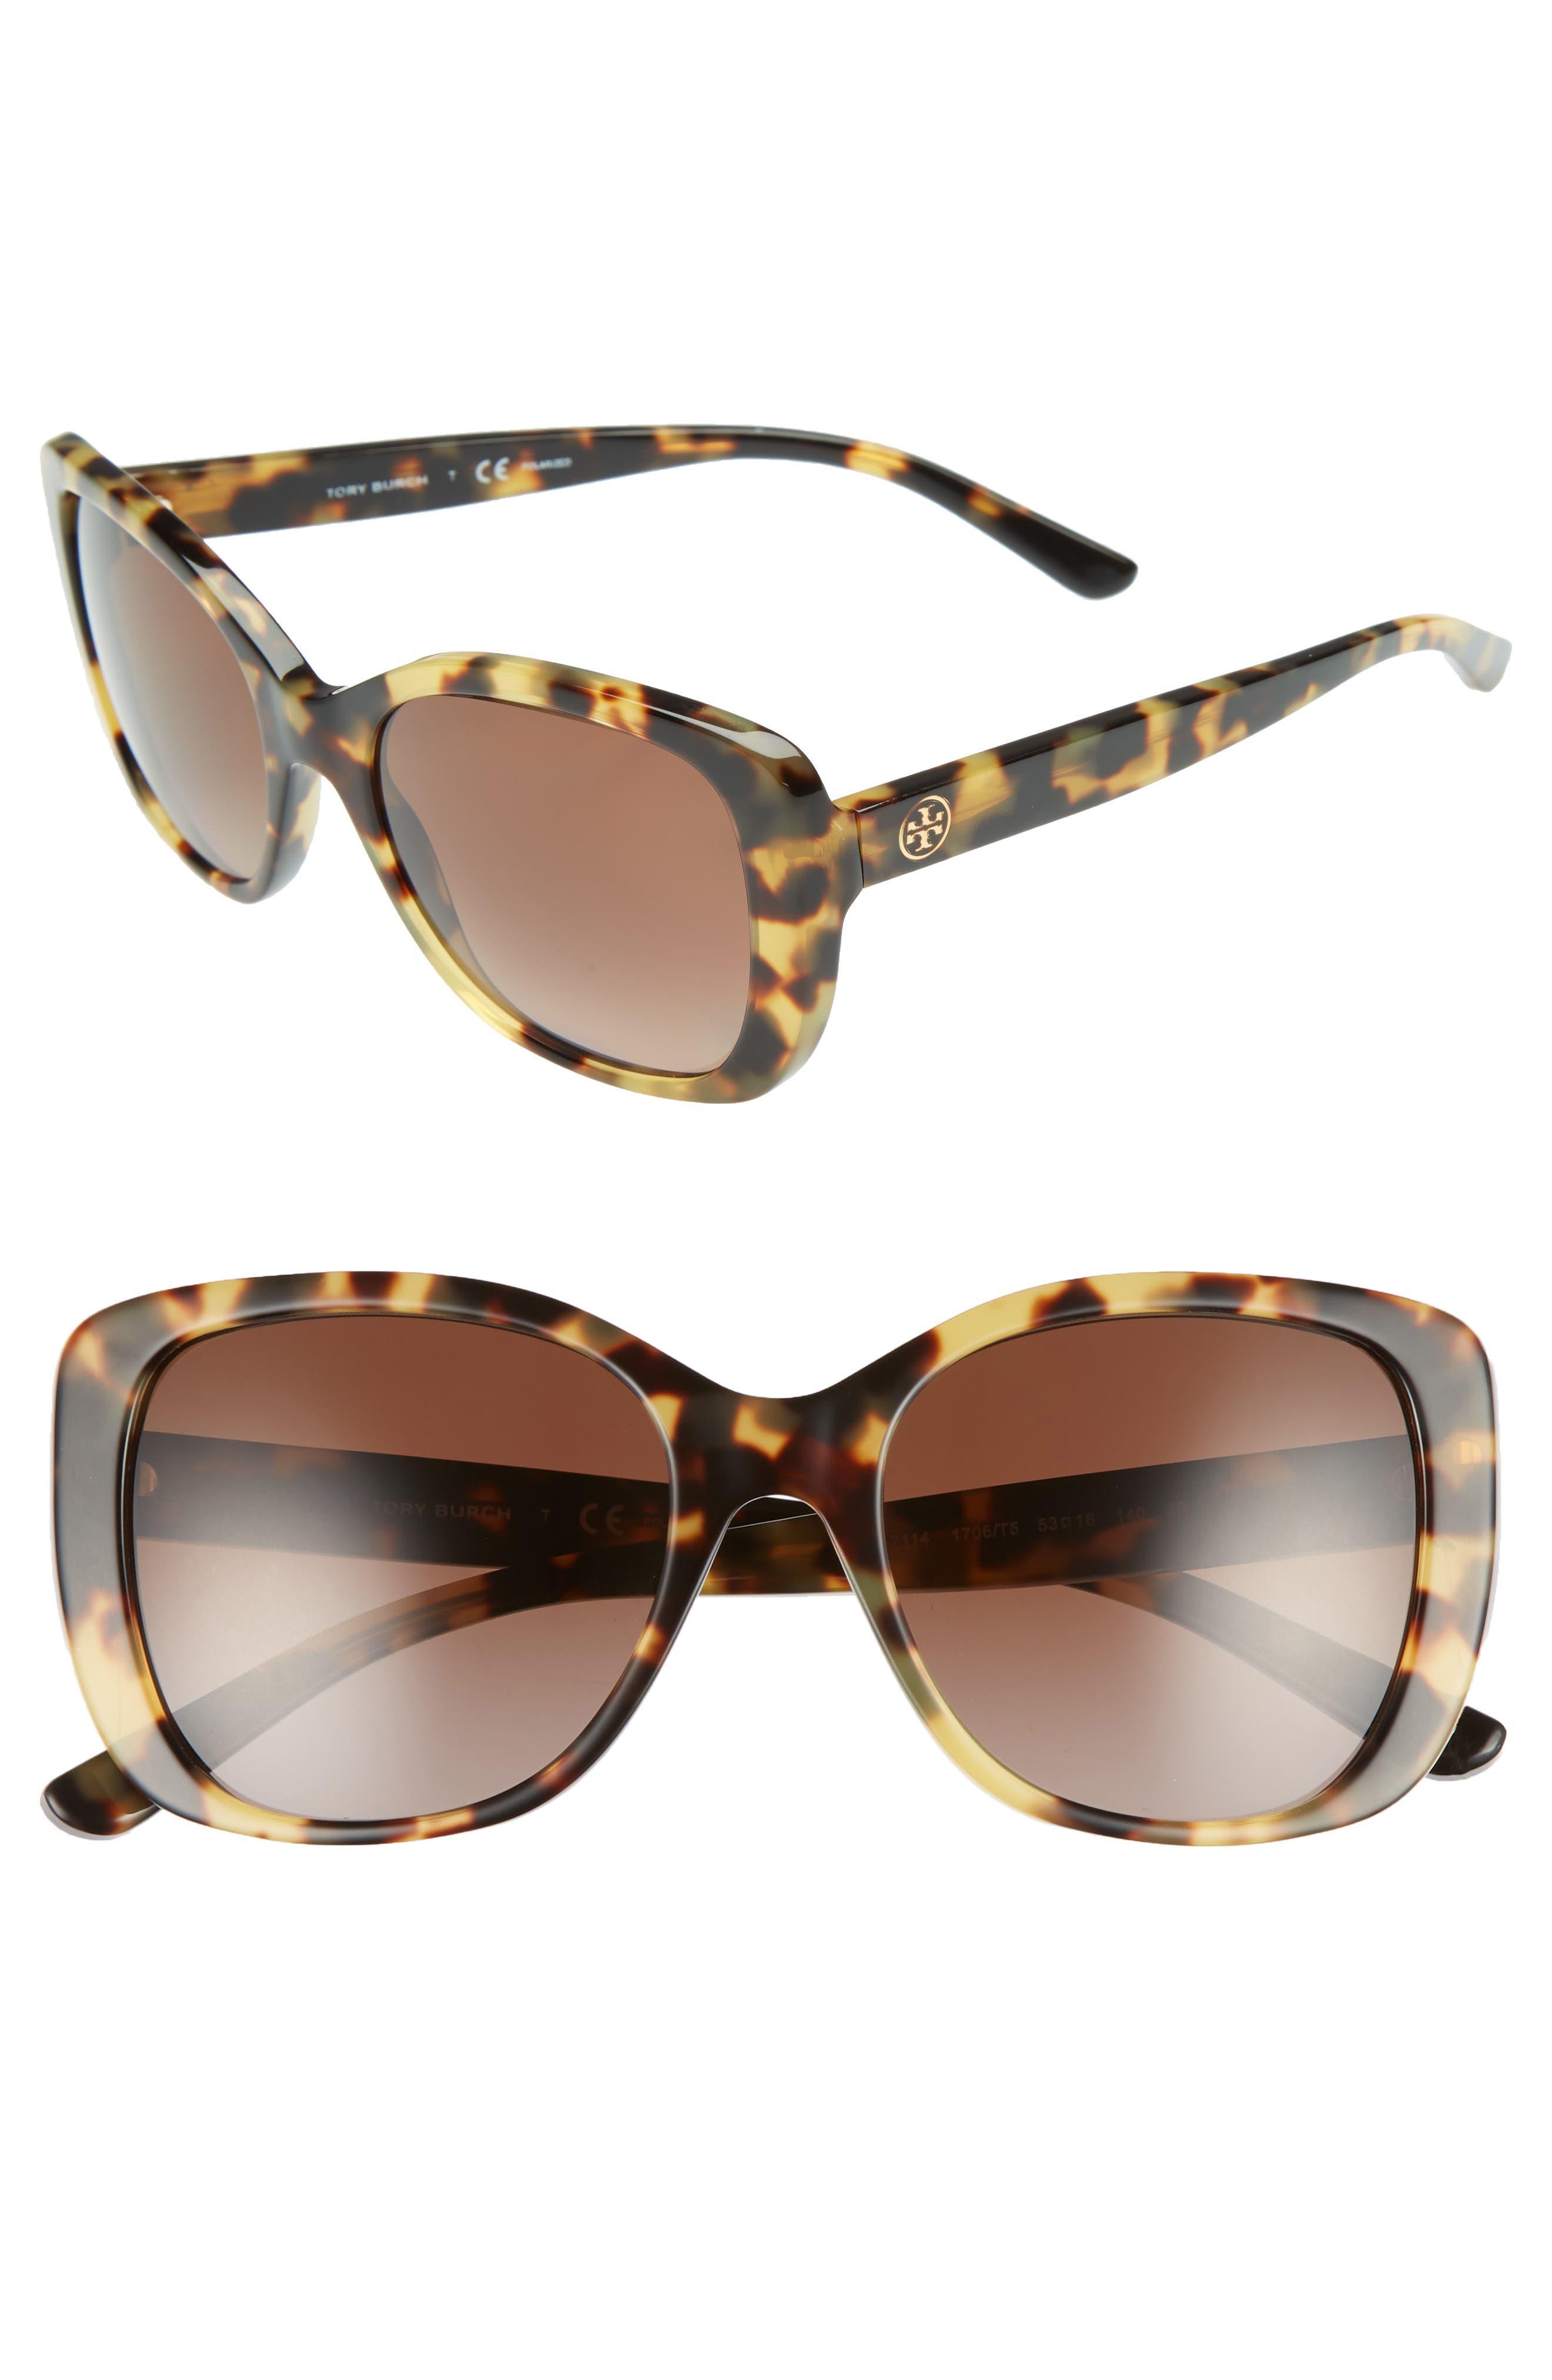 53mm Polarized Rectangle Sunglasses,                         Main,                         color, TOKYO TORTOISE GRADIENT